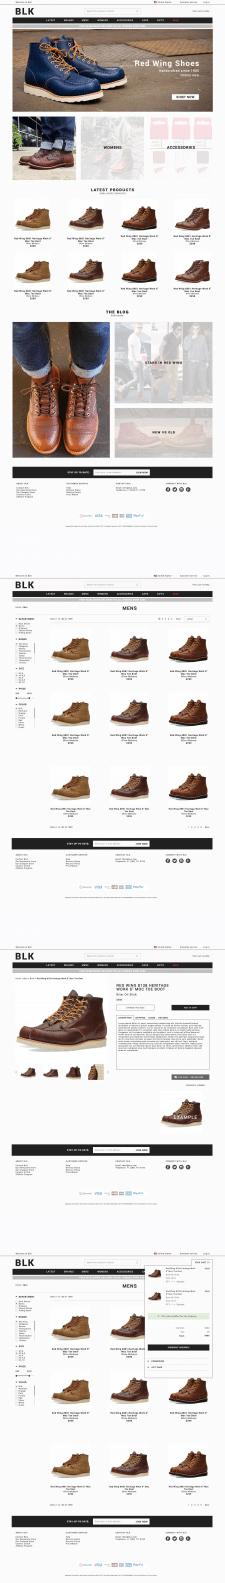 Интернет магазин  обуви BLK